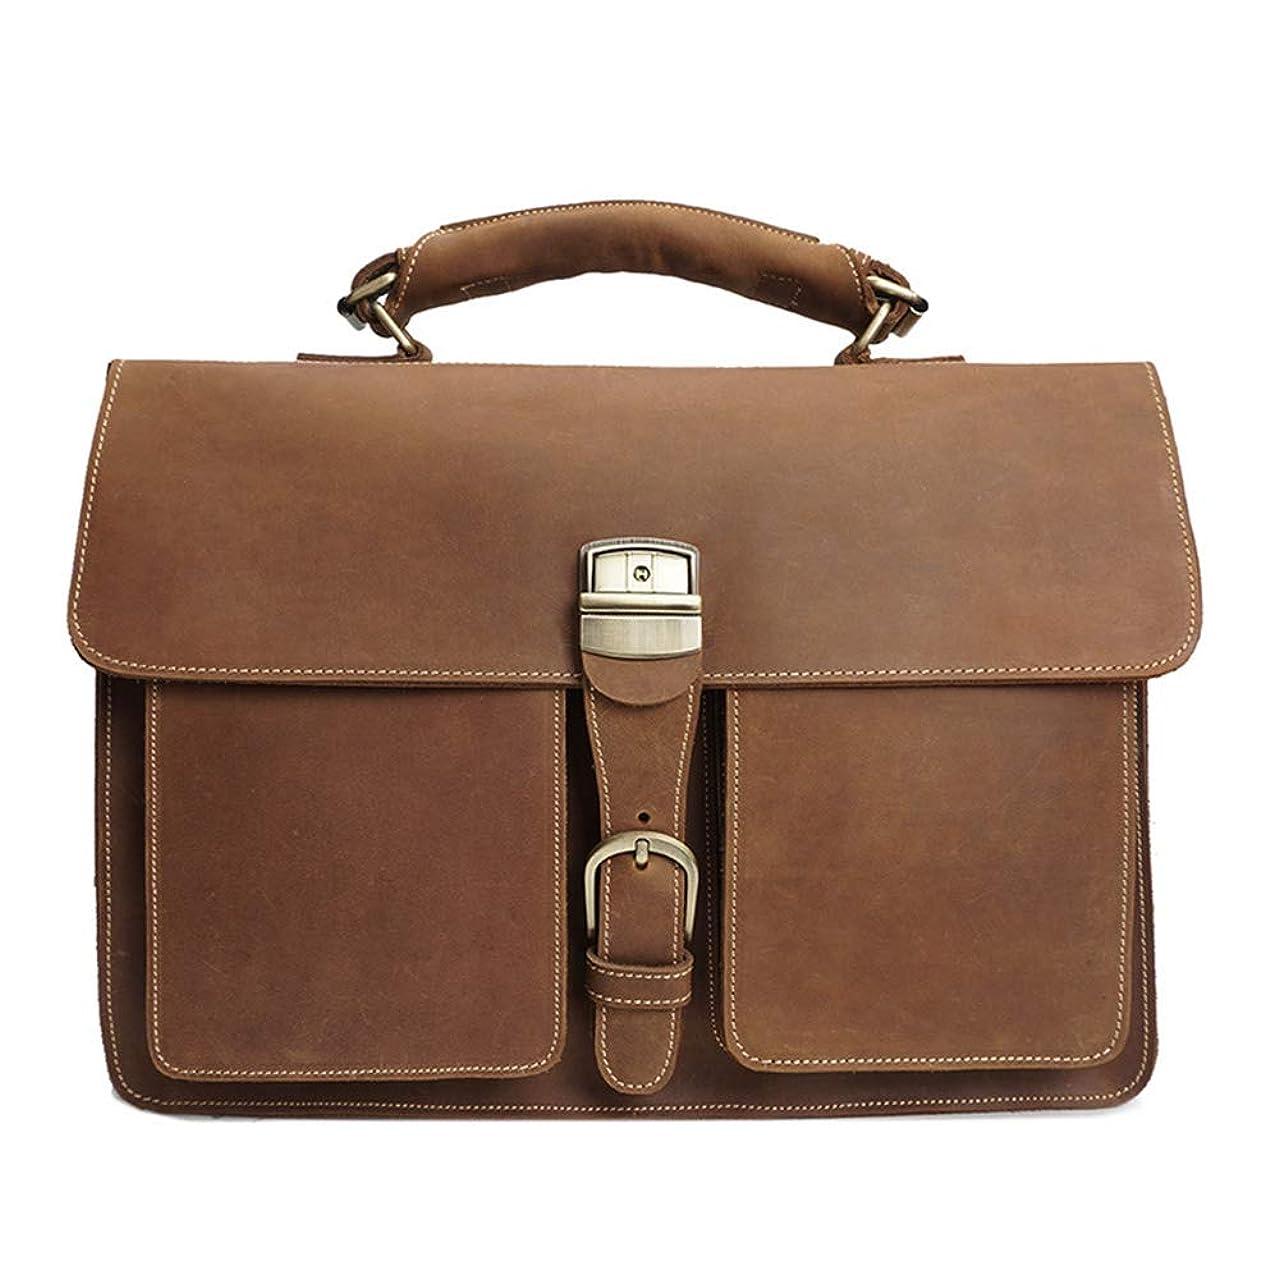 FGEFG Men's Briefcase Large Capacity Leather Handbag Multi-Layer Waterproof Laptop Business Shoulder Crossbody Tote Bag (Color : Brown)